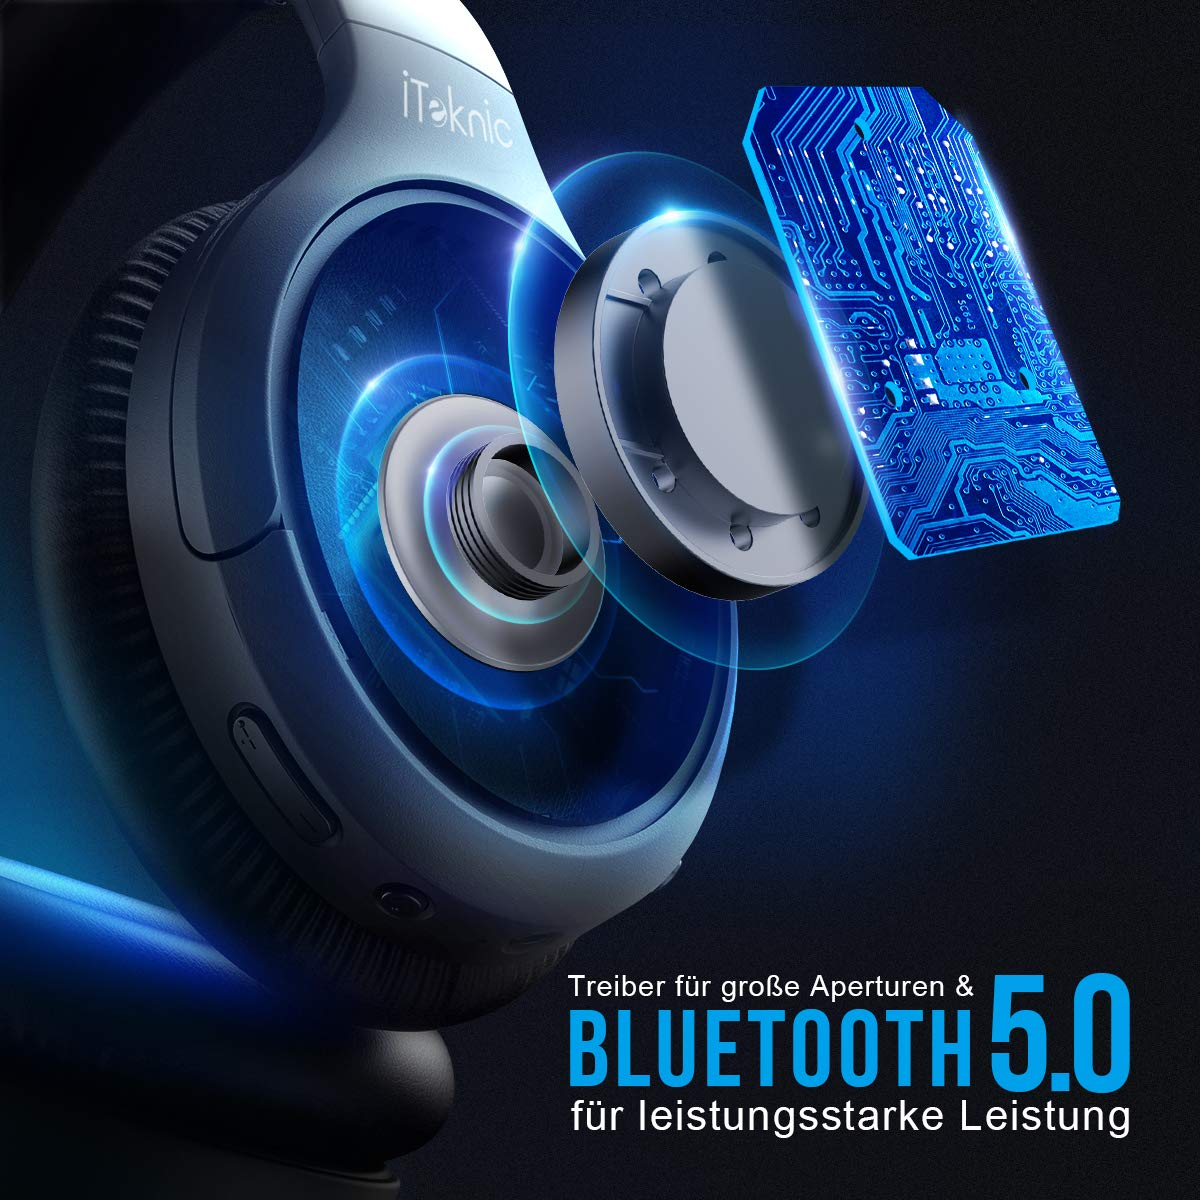 iTeknic Bluetooth Kopfhörer Over-Ear mit aktiver Geräuschunterdrückung, Faltbarer Kabellose Hi-Fi Stereo, CVC 8.0 Noise Cancelling für Integriertem Mikrofon Freisprechen